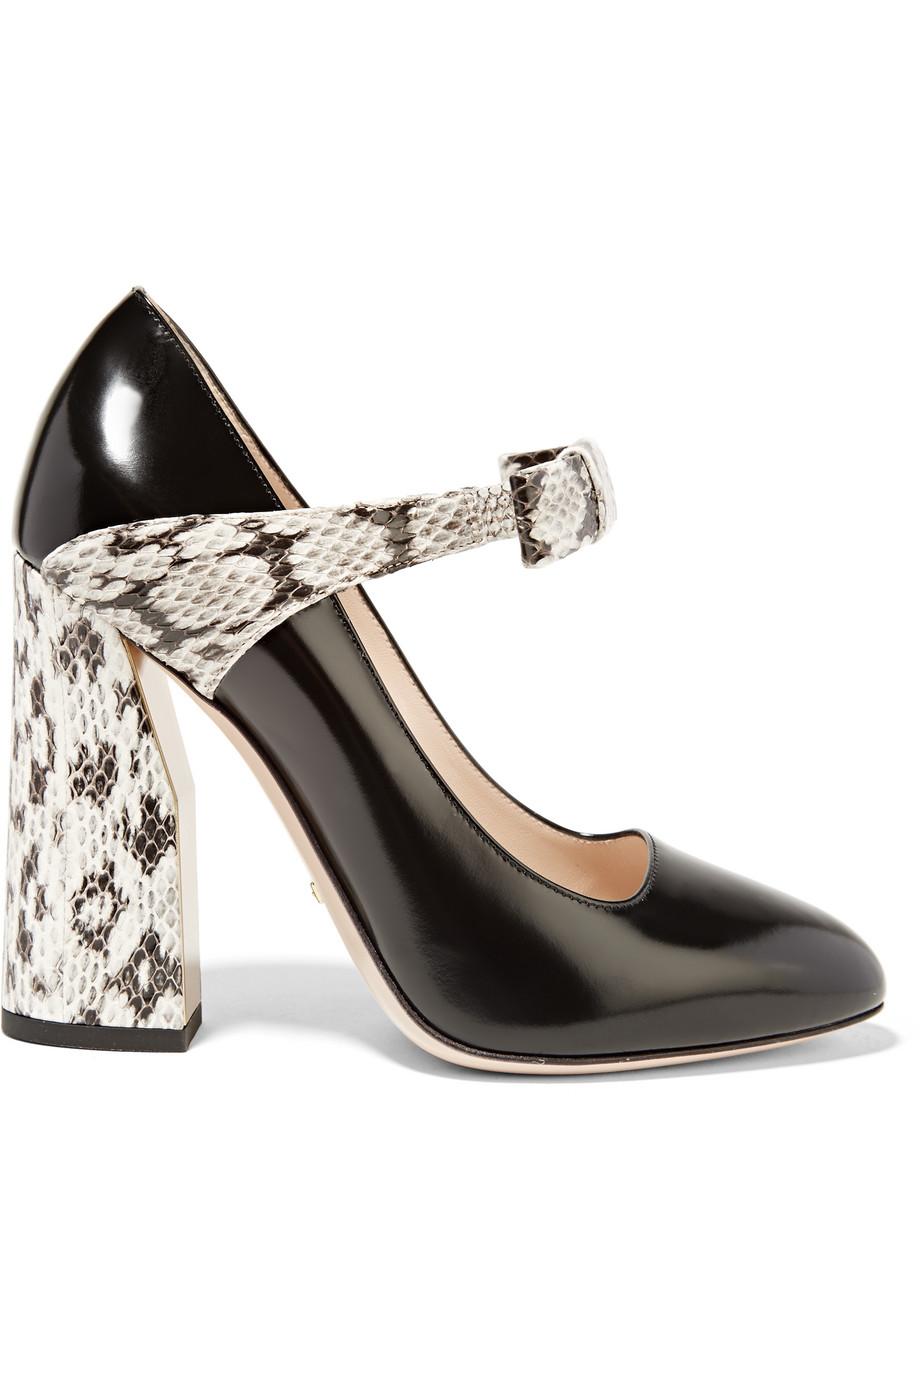 Gucci Bow-Embellished Elaphe and Leather Pumps, Black/Snake Print, Women's US Size: 6.5, Size: 37